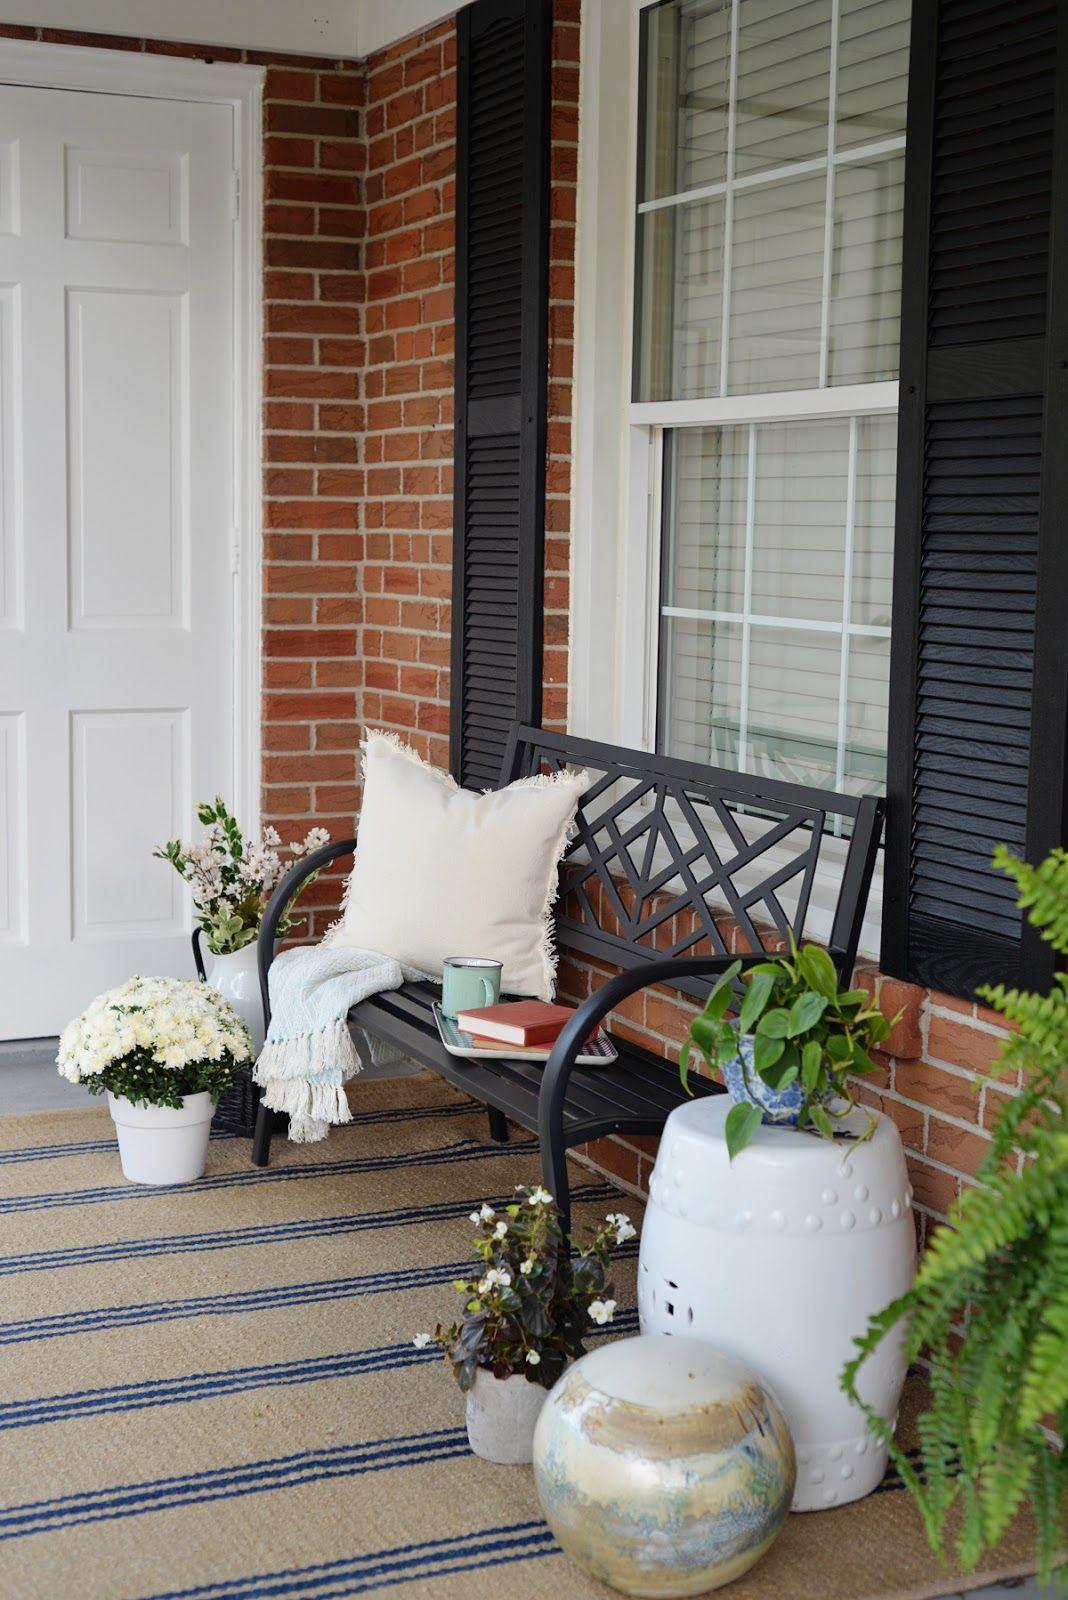 Rambling Renovators Front Porch Decorating Ideas For The Summer Front Porch Decorating Porch Decorating Front Porch Furniture